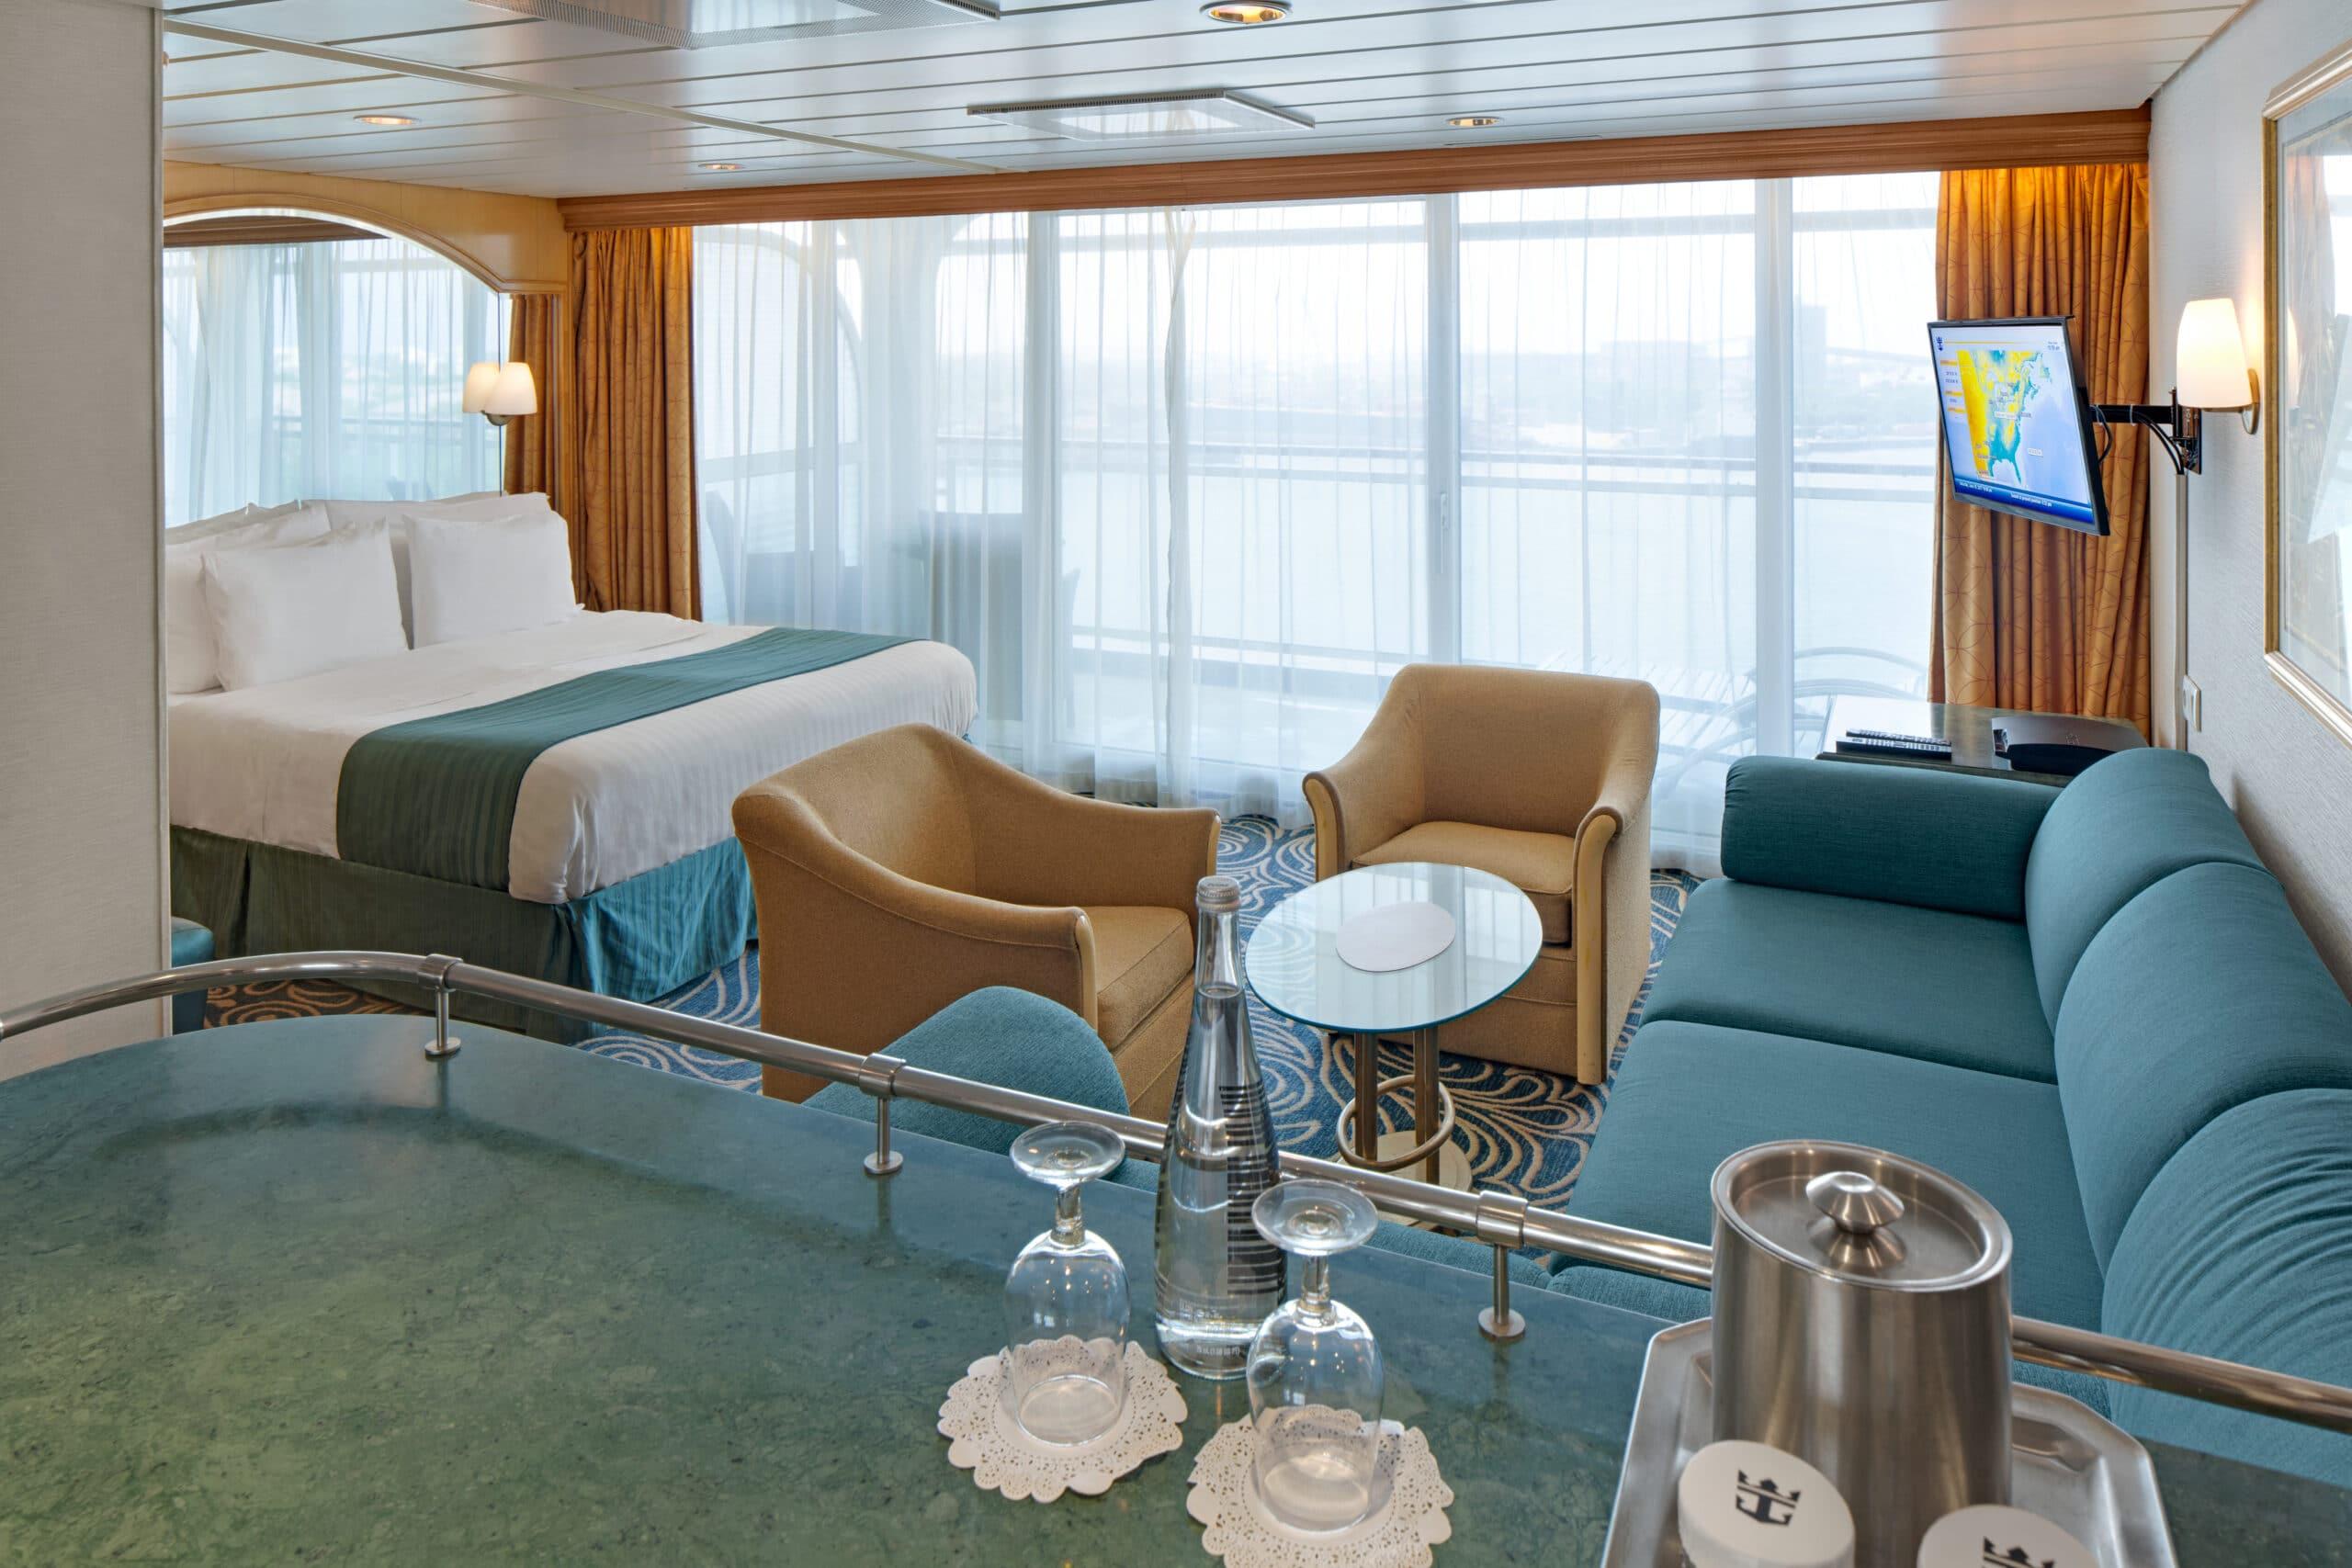 Royal-Caribbean-International-Vision-of-the-Seas-schip-cruiseschip-categorie-GS-Grand-Suite